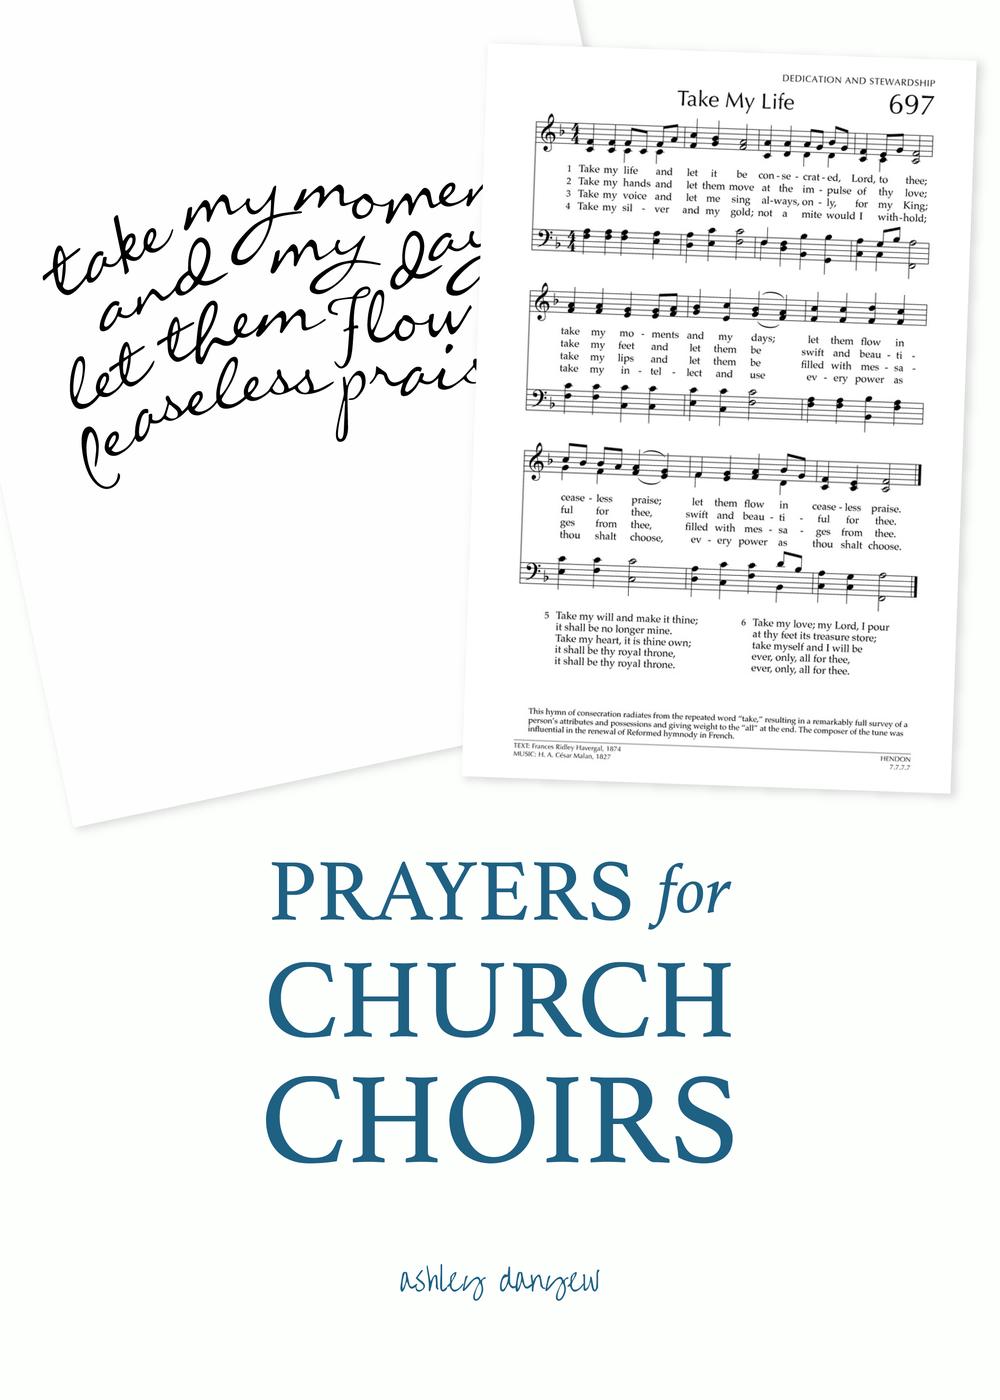 List of prayer choruses